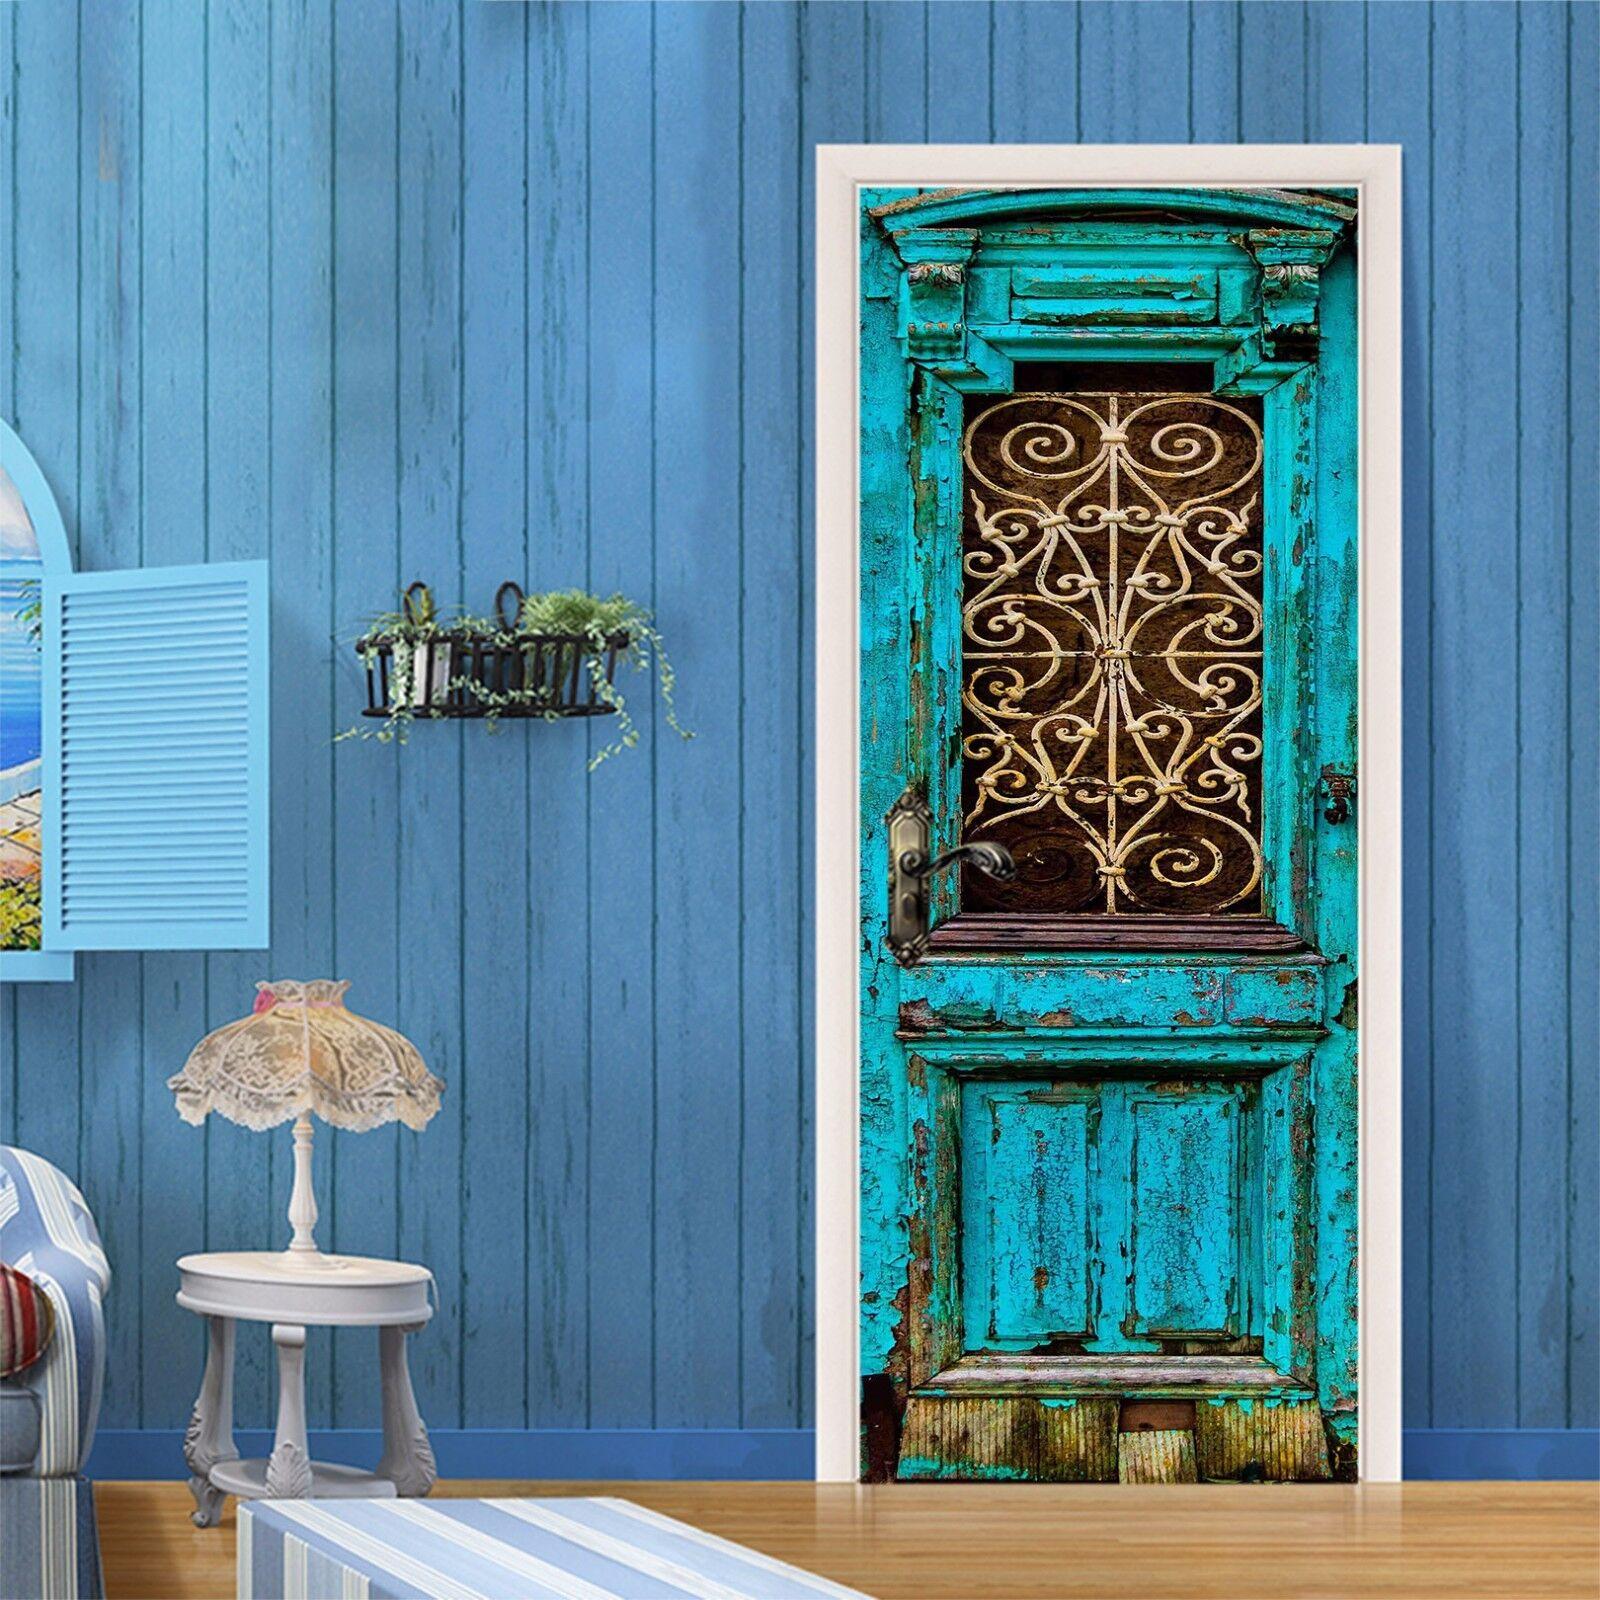 3D Retro Muster 43 Tür Mauer Wandgemälde Foto Wandaufkleber AJ WALL DE Lemon